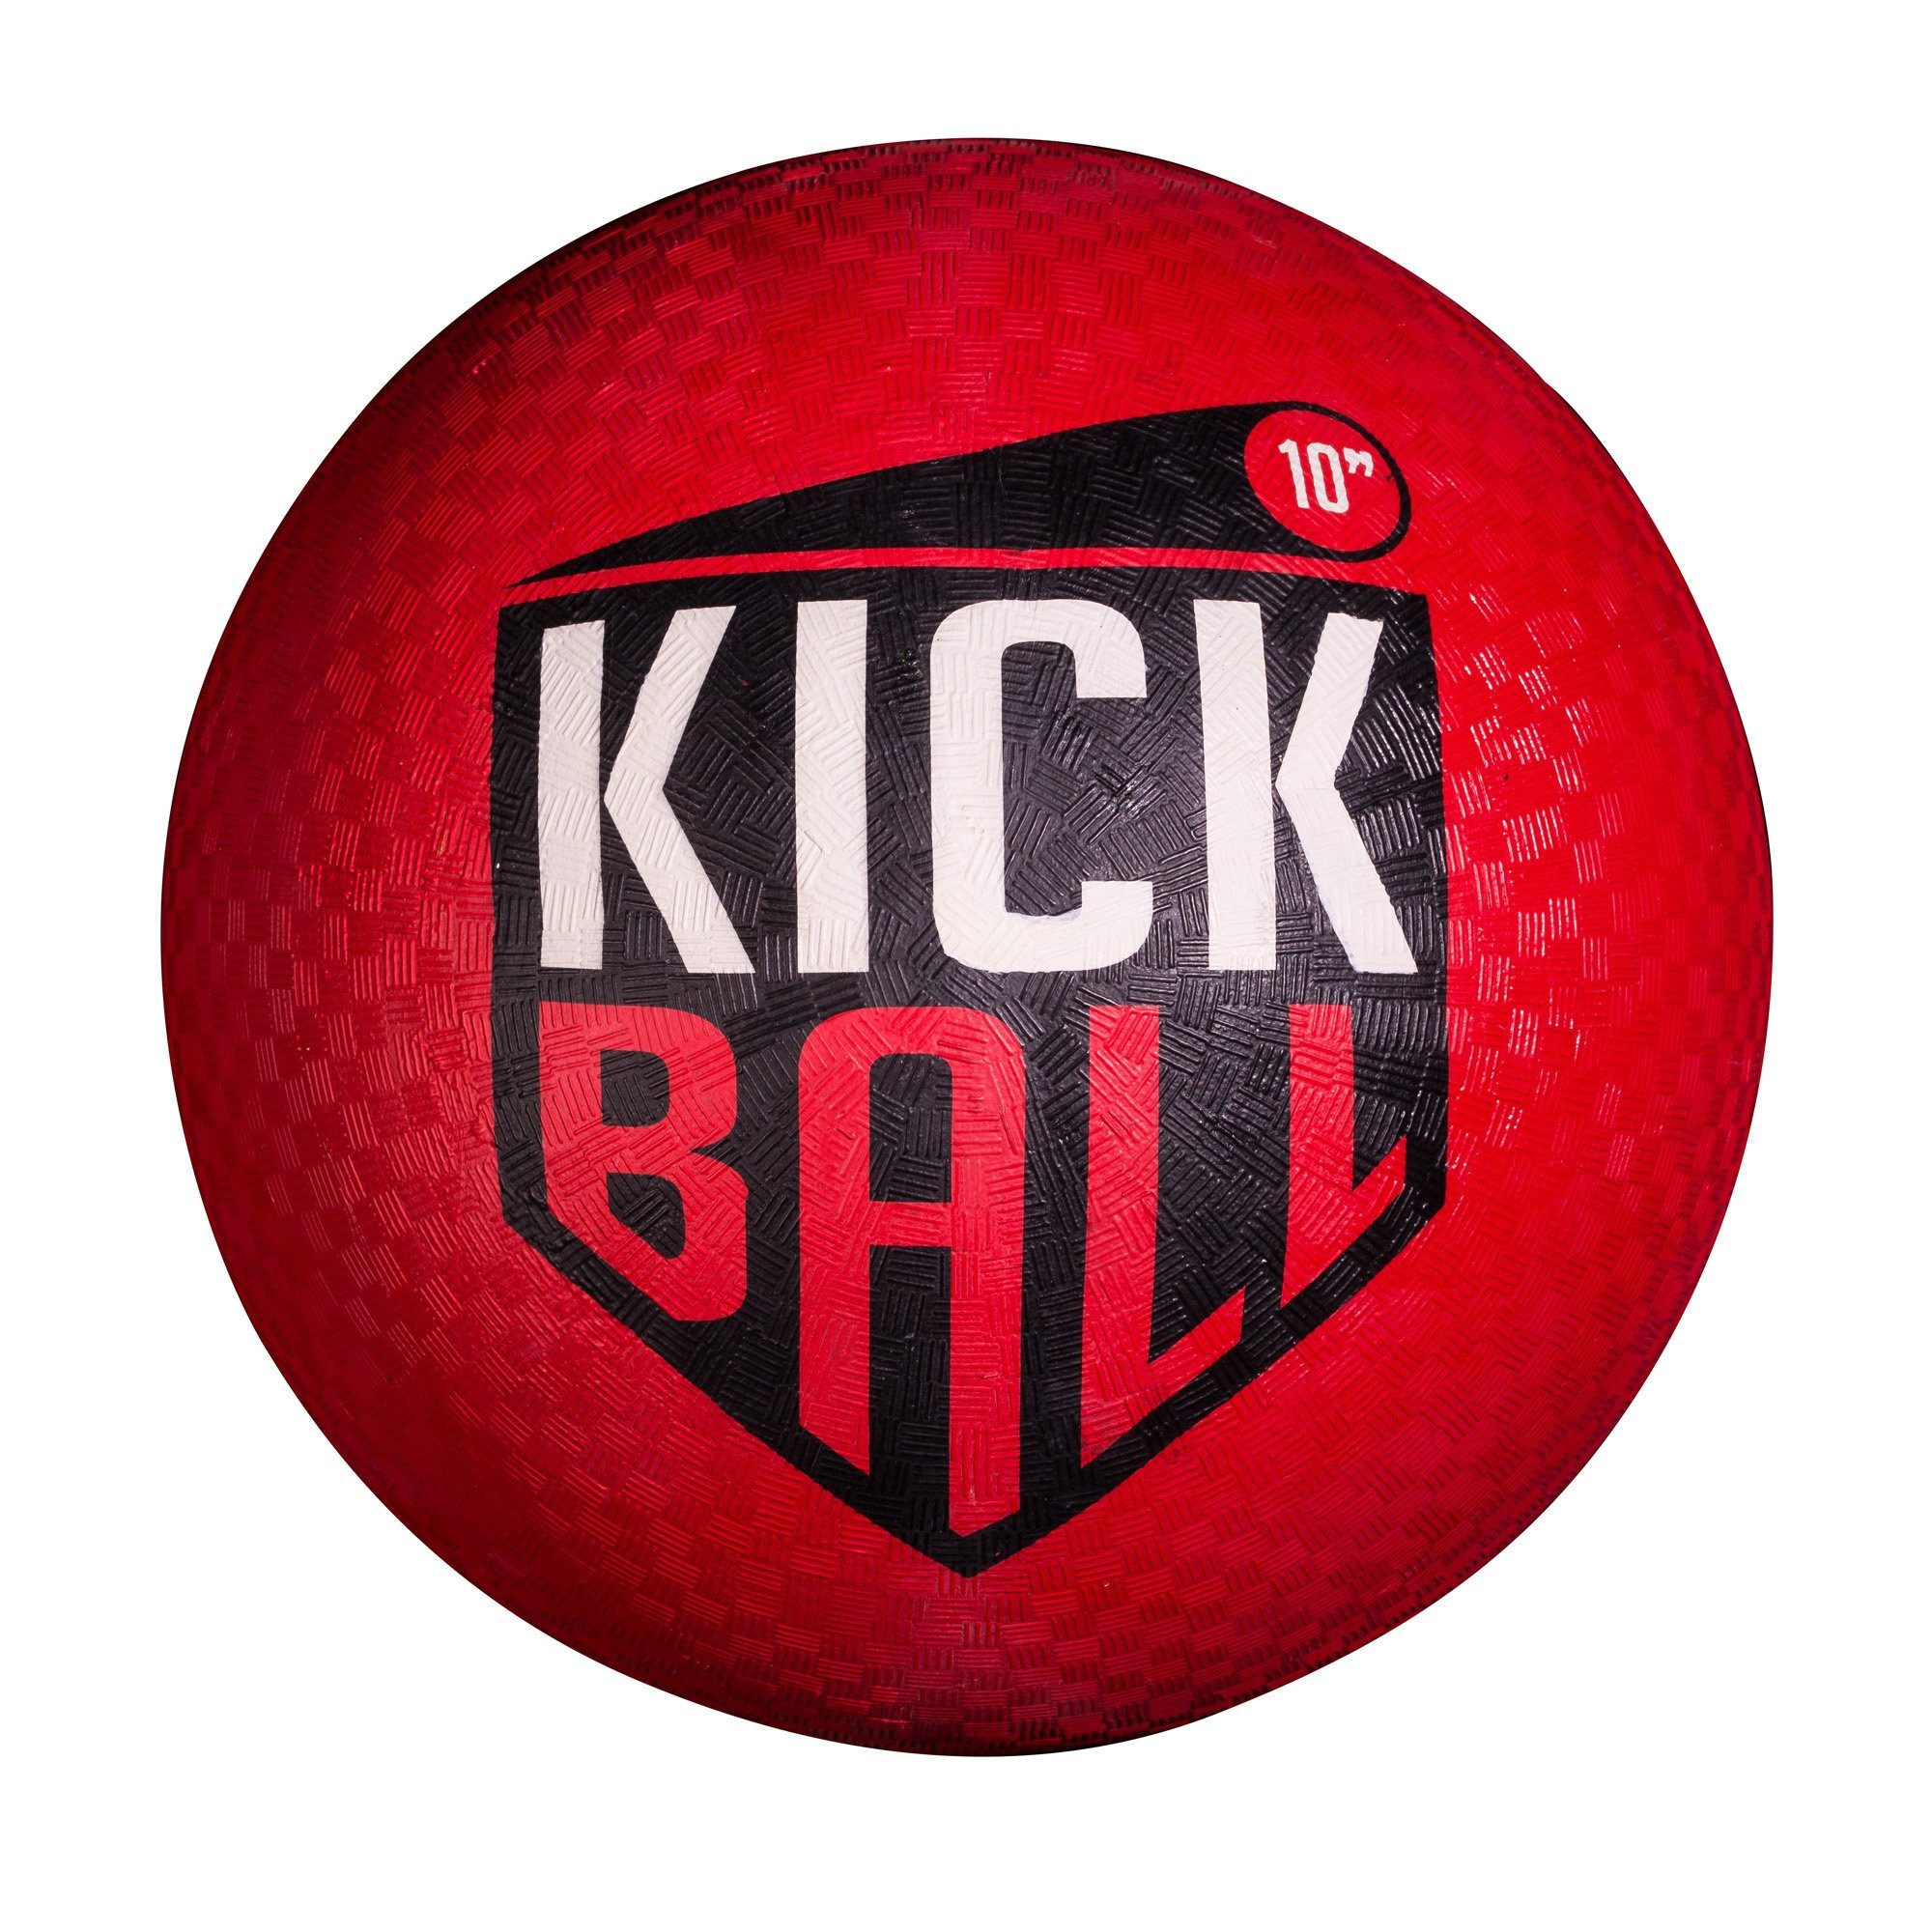 Franklin Sports Rubber Kickball - 10 Inch Diameter by Franklin Sports